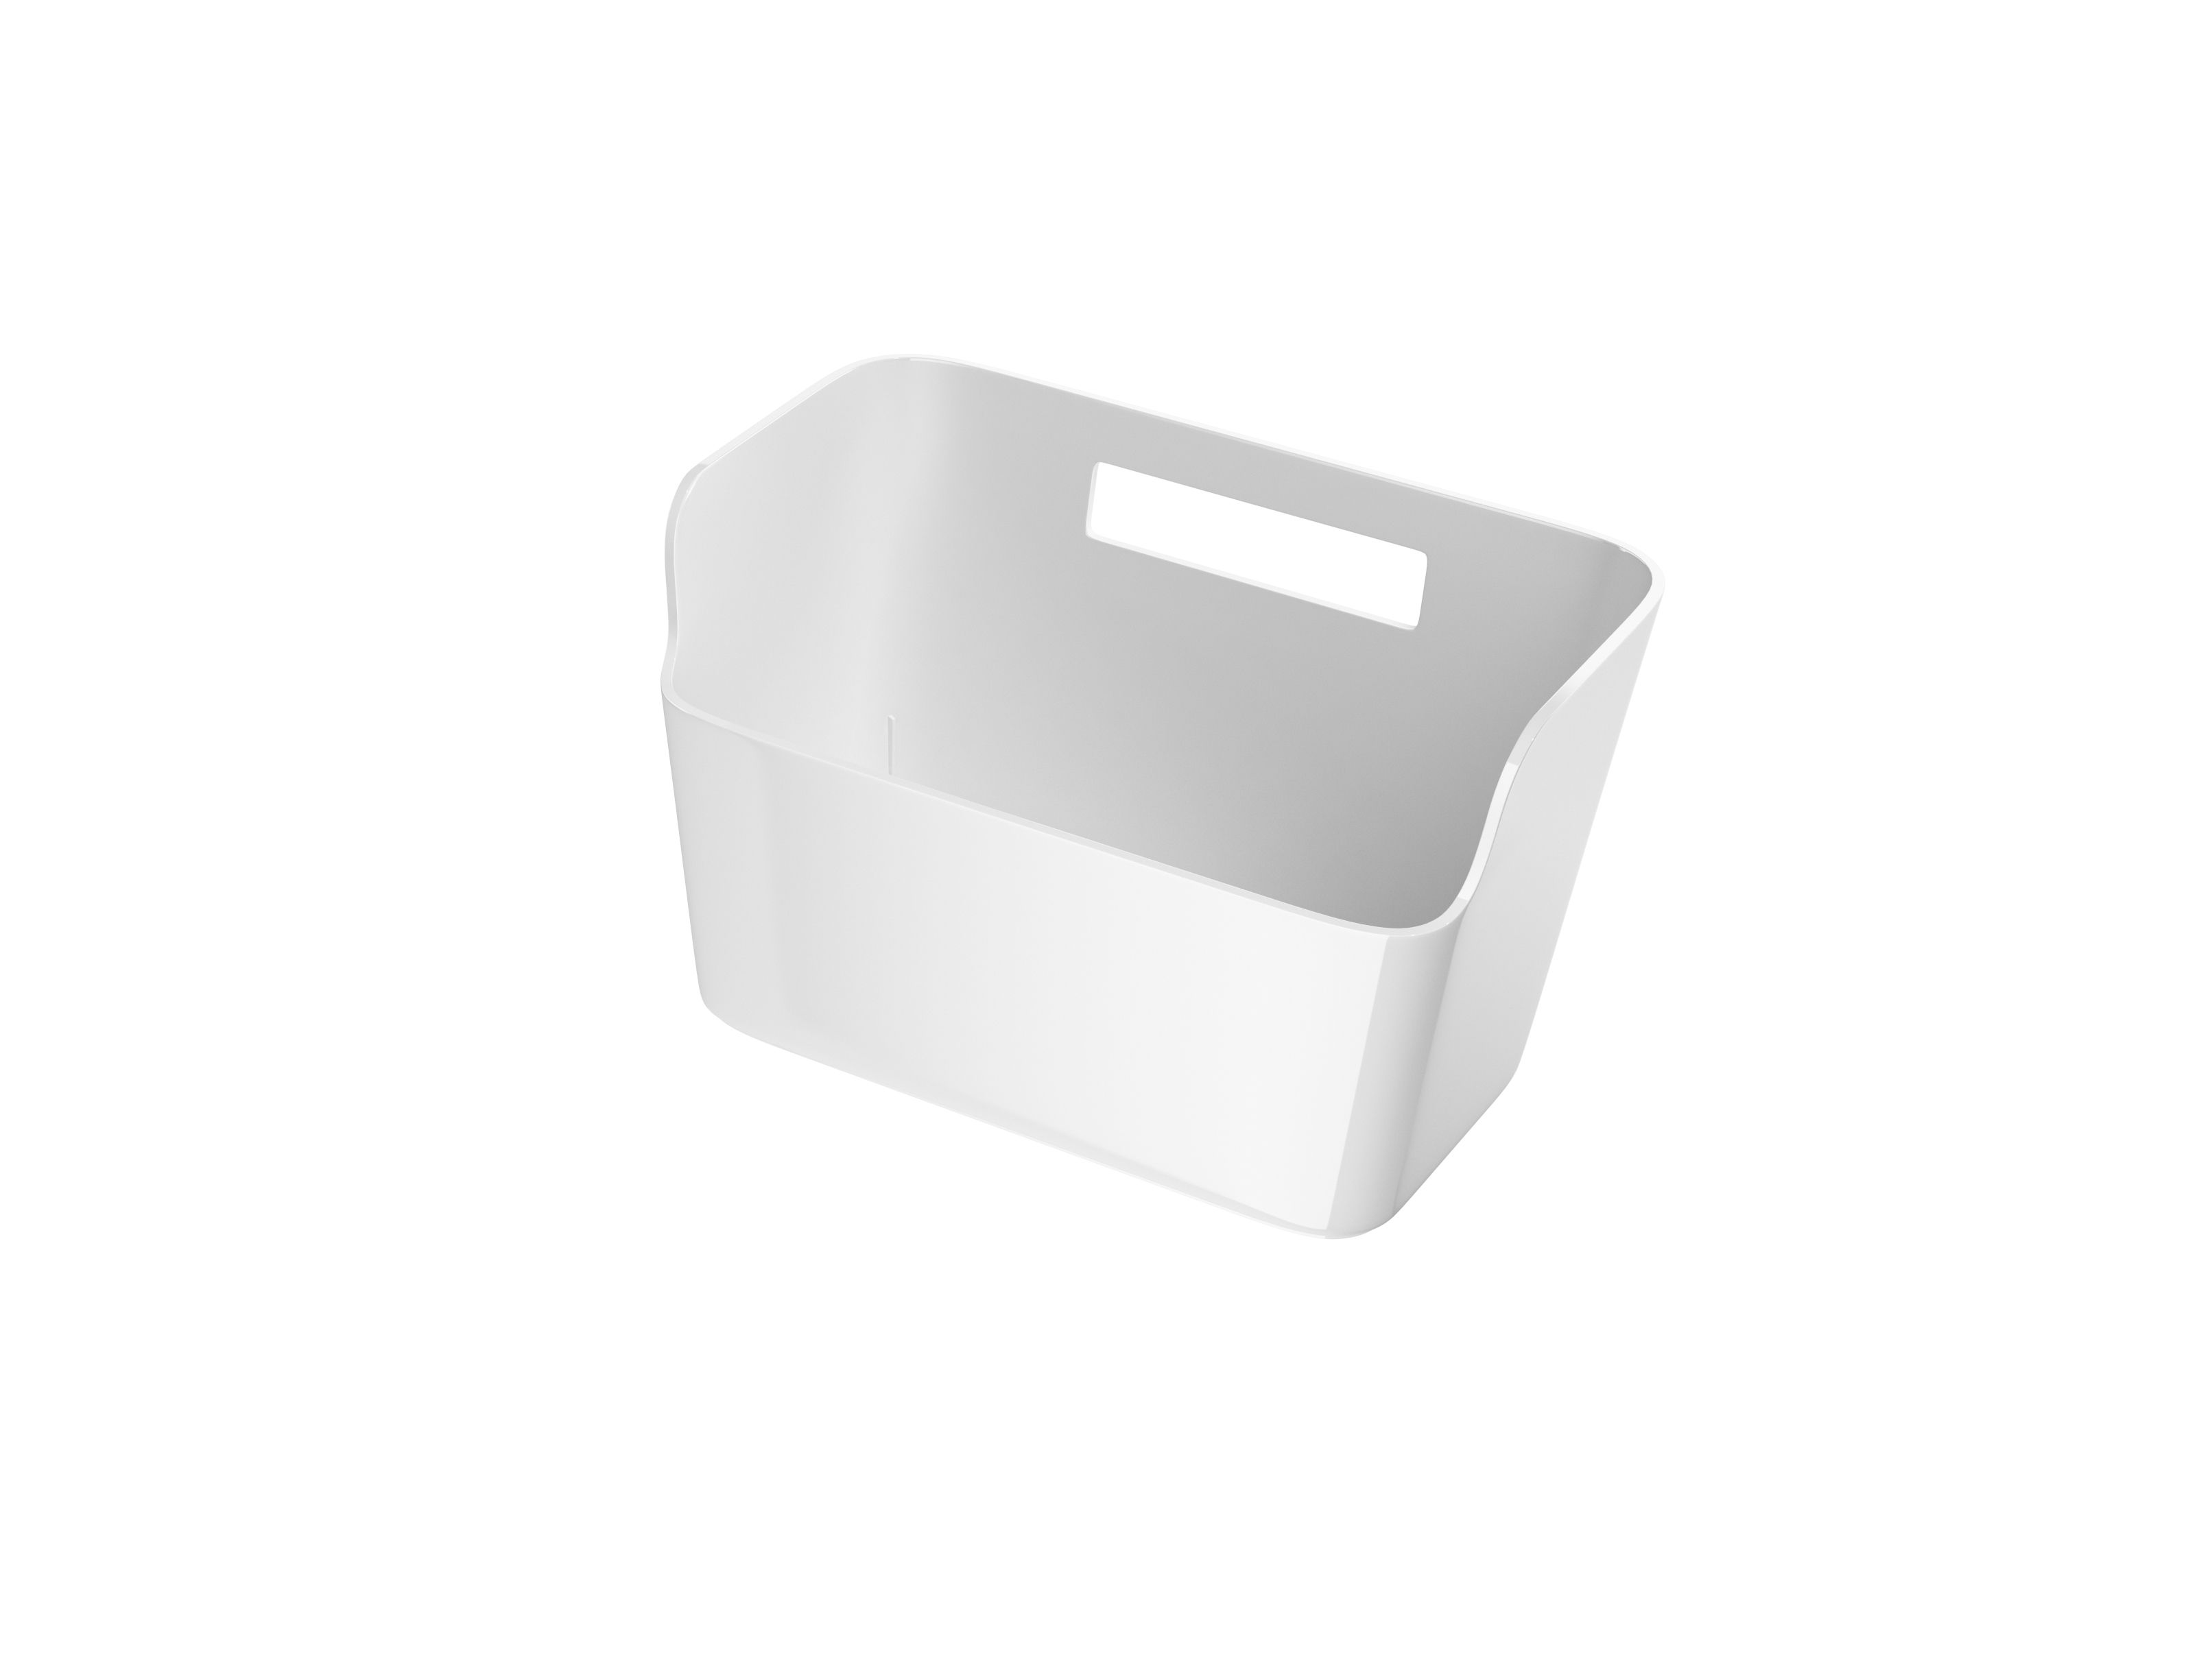 Cooke Lewis Praa White Bathroom Storage Box With Hook Departments Diy At B Q